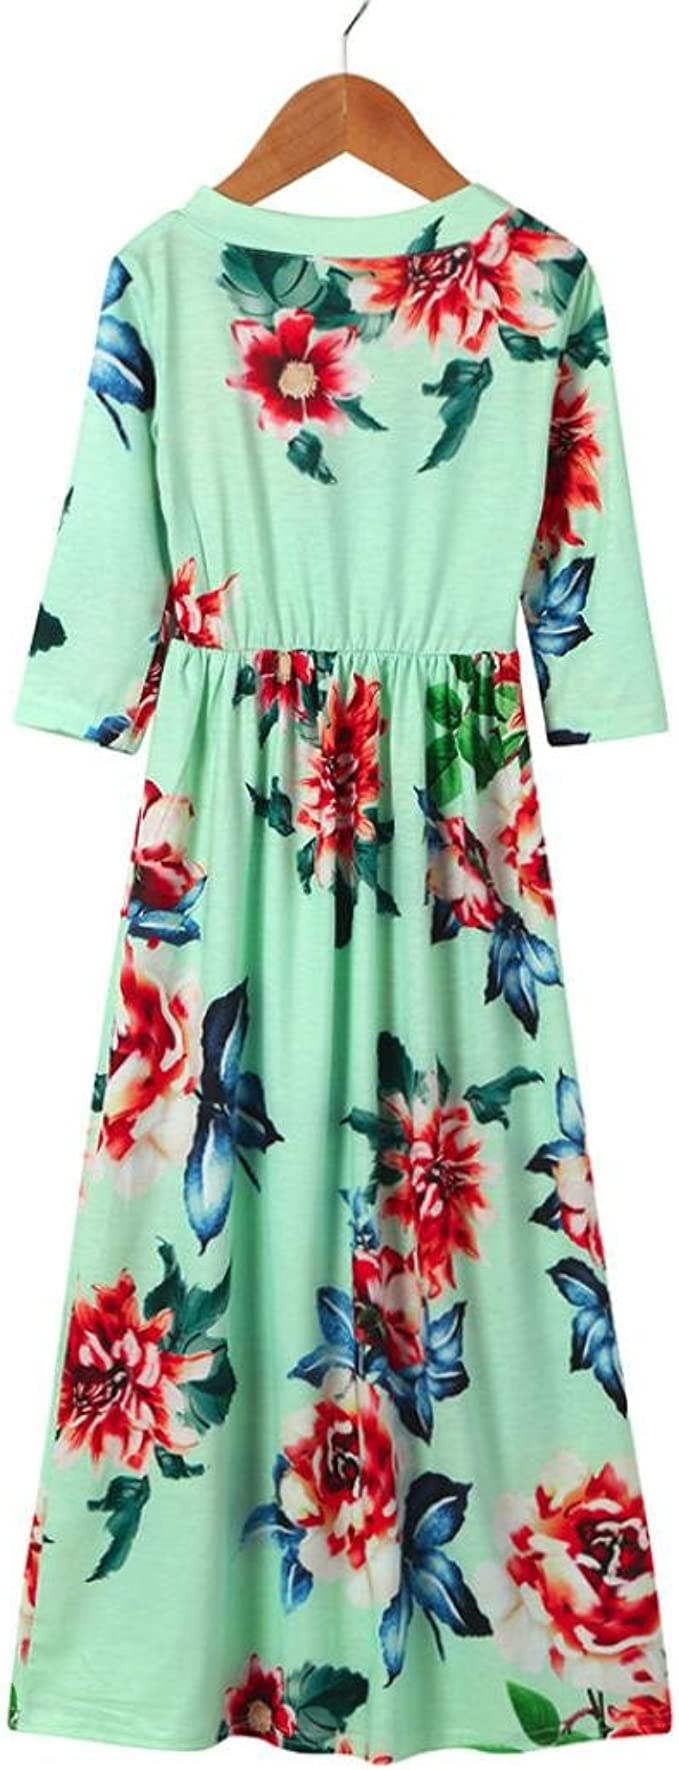 Memela Baby Clothes,Toddler Kids Baby Girl Flower Rose Denim Long Sleeve Princess Dress Outfits